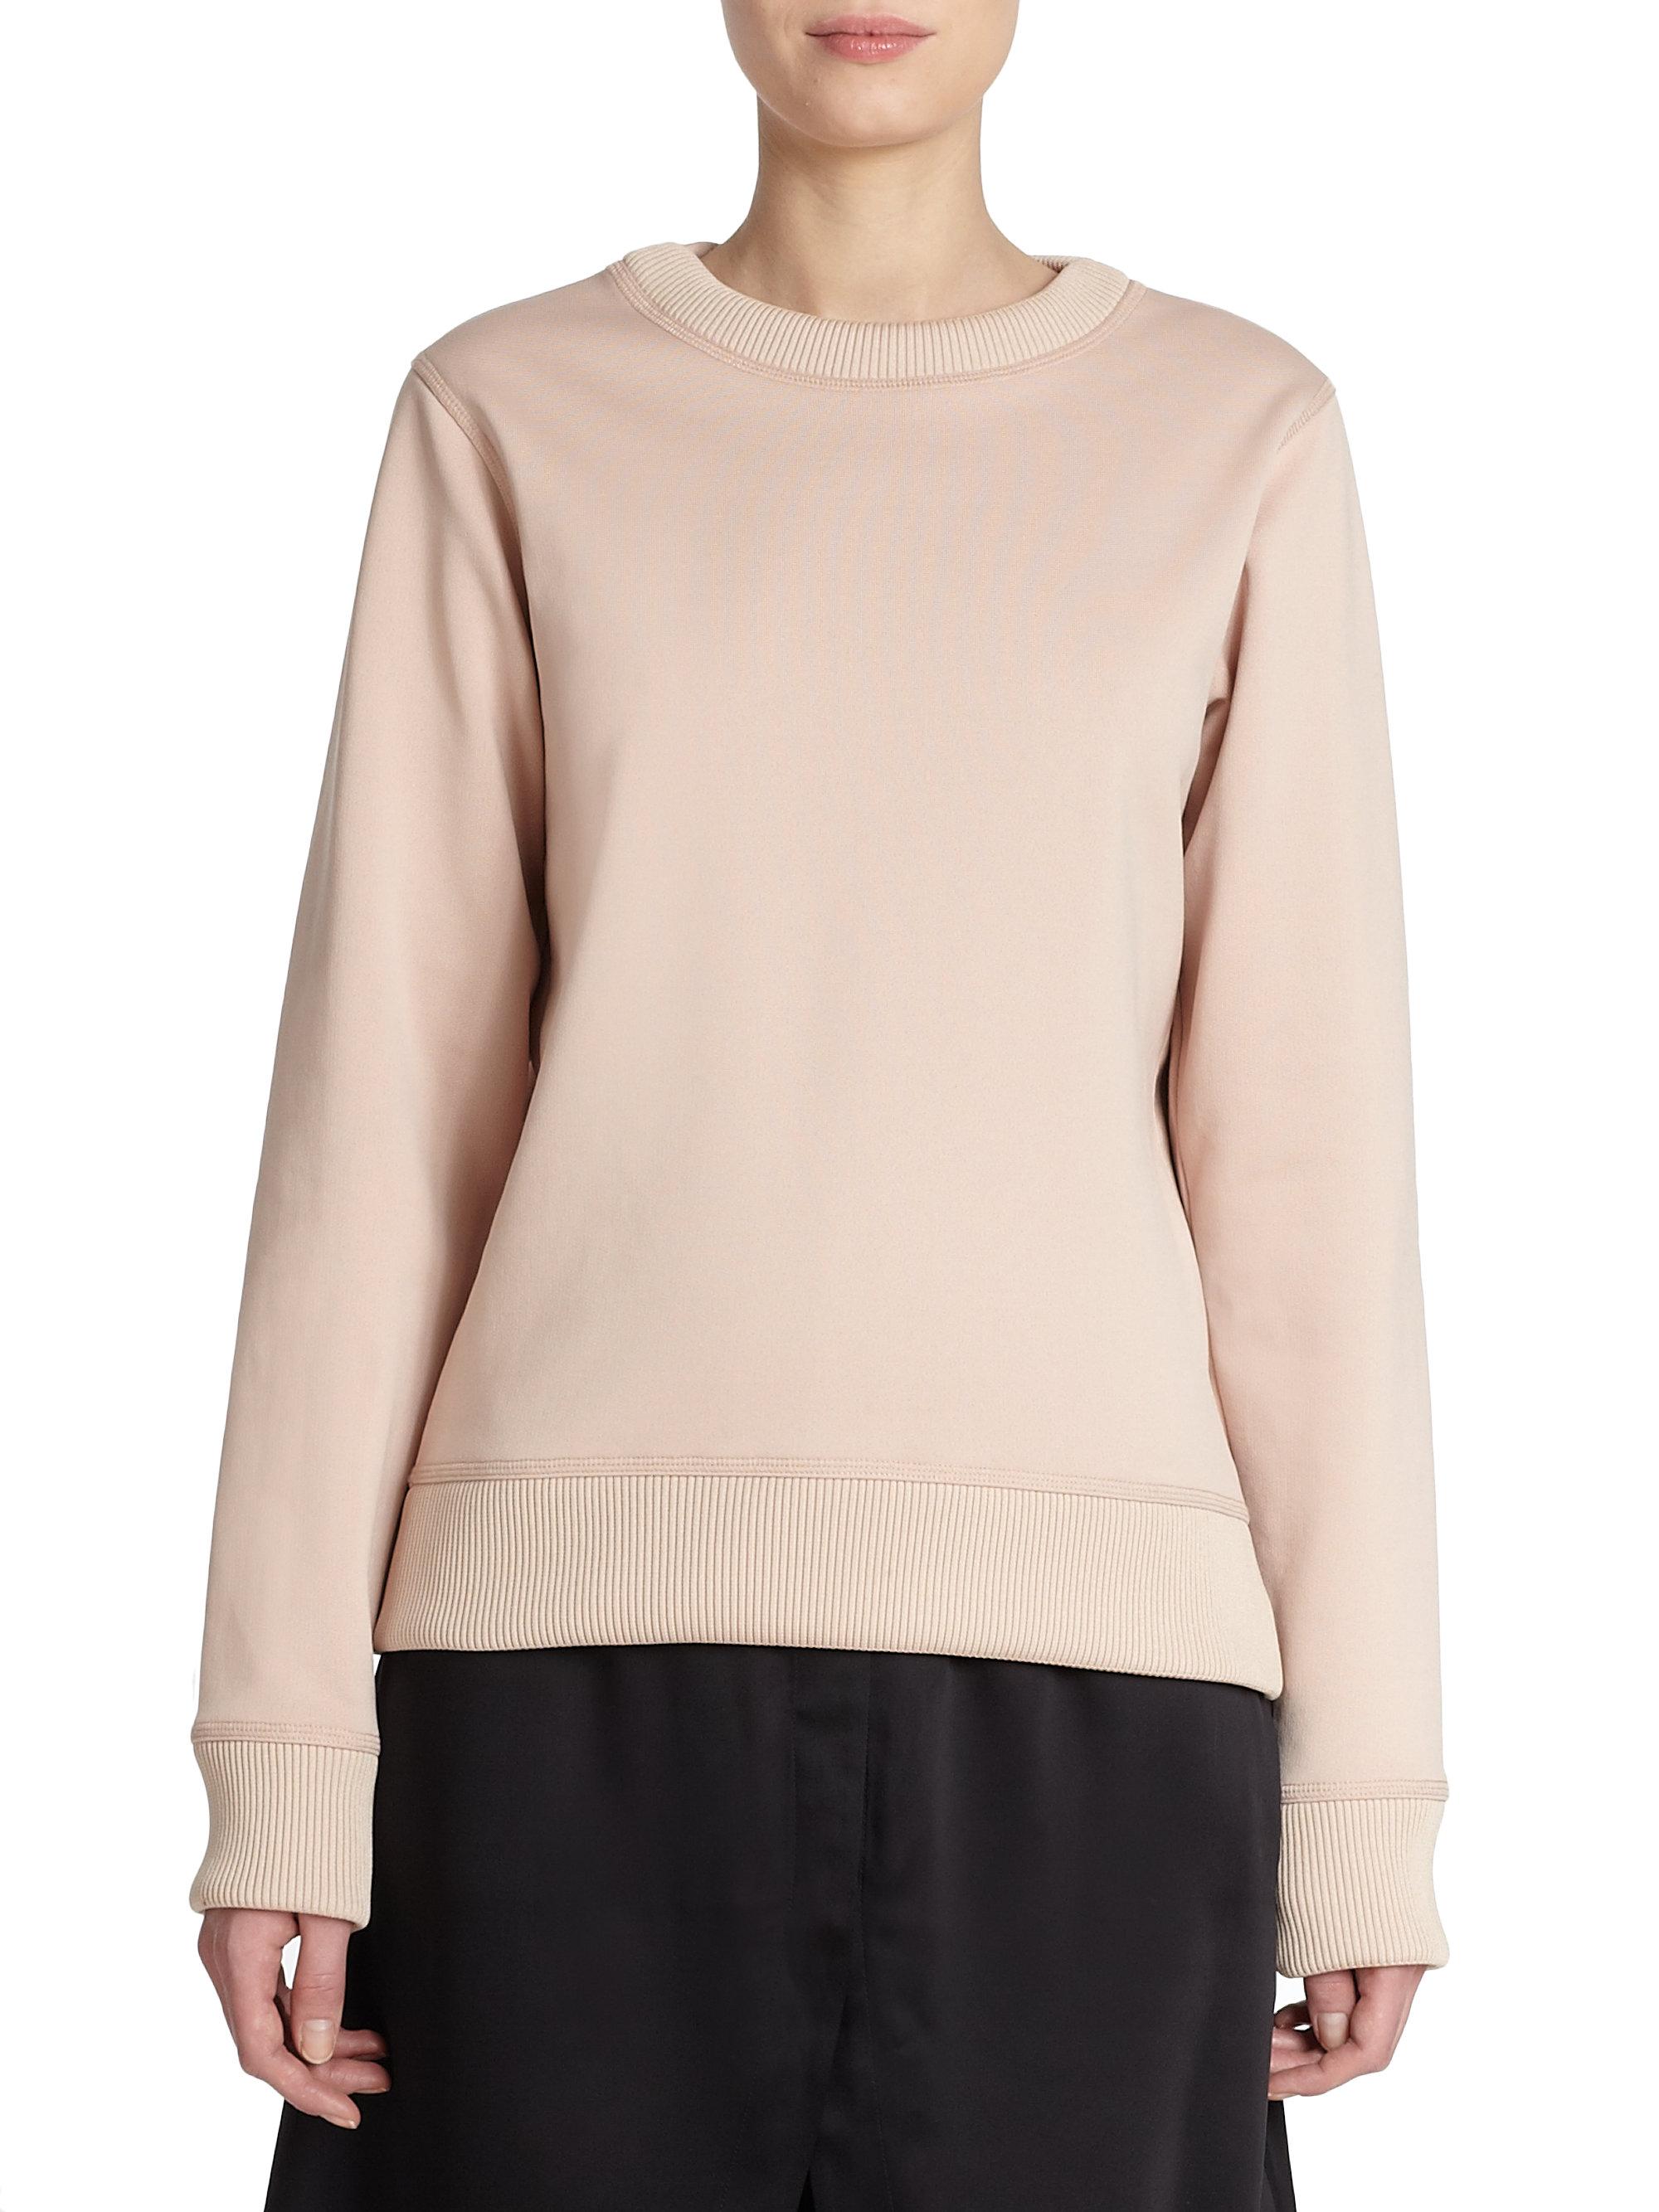 lyst acne studios vernina fleece sweatshirt in natural. Black Bedroom Furniture Sets. Home Design Ideas